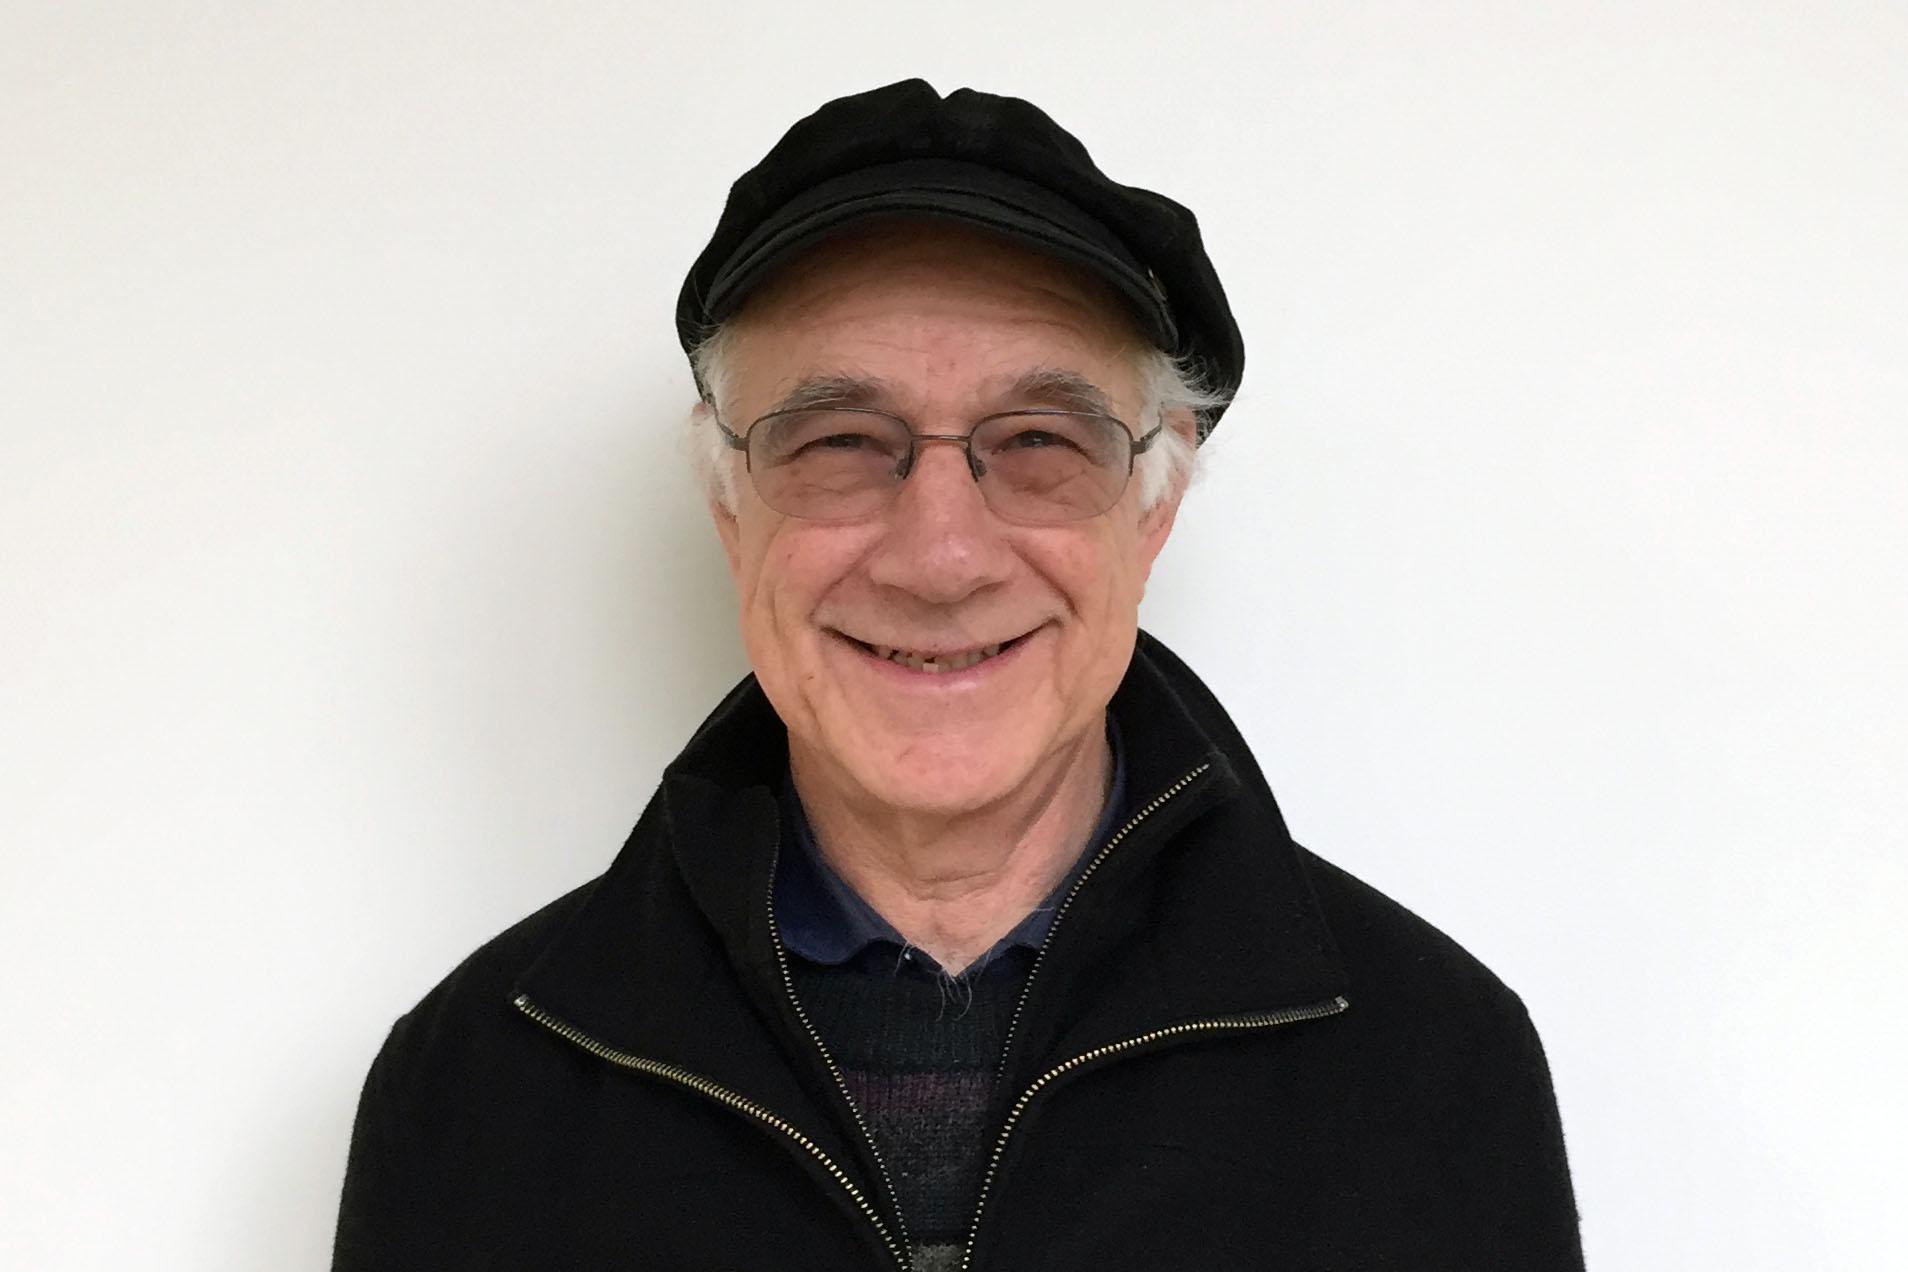 Michael Burawoy (Aaron Cain, WFIU)